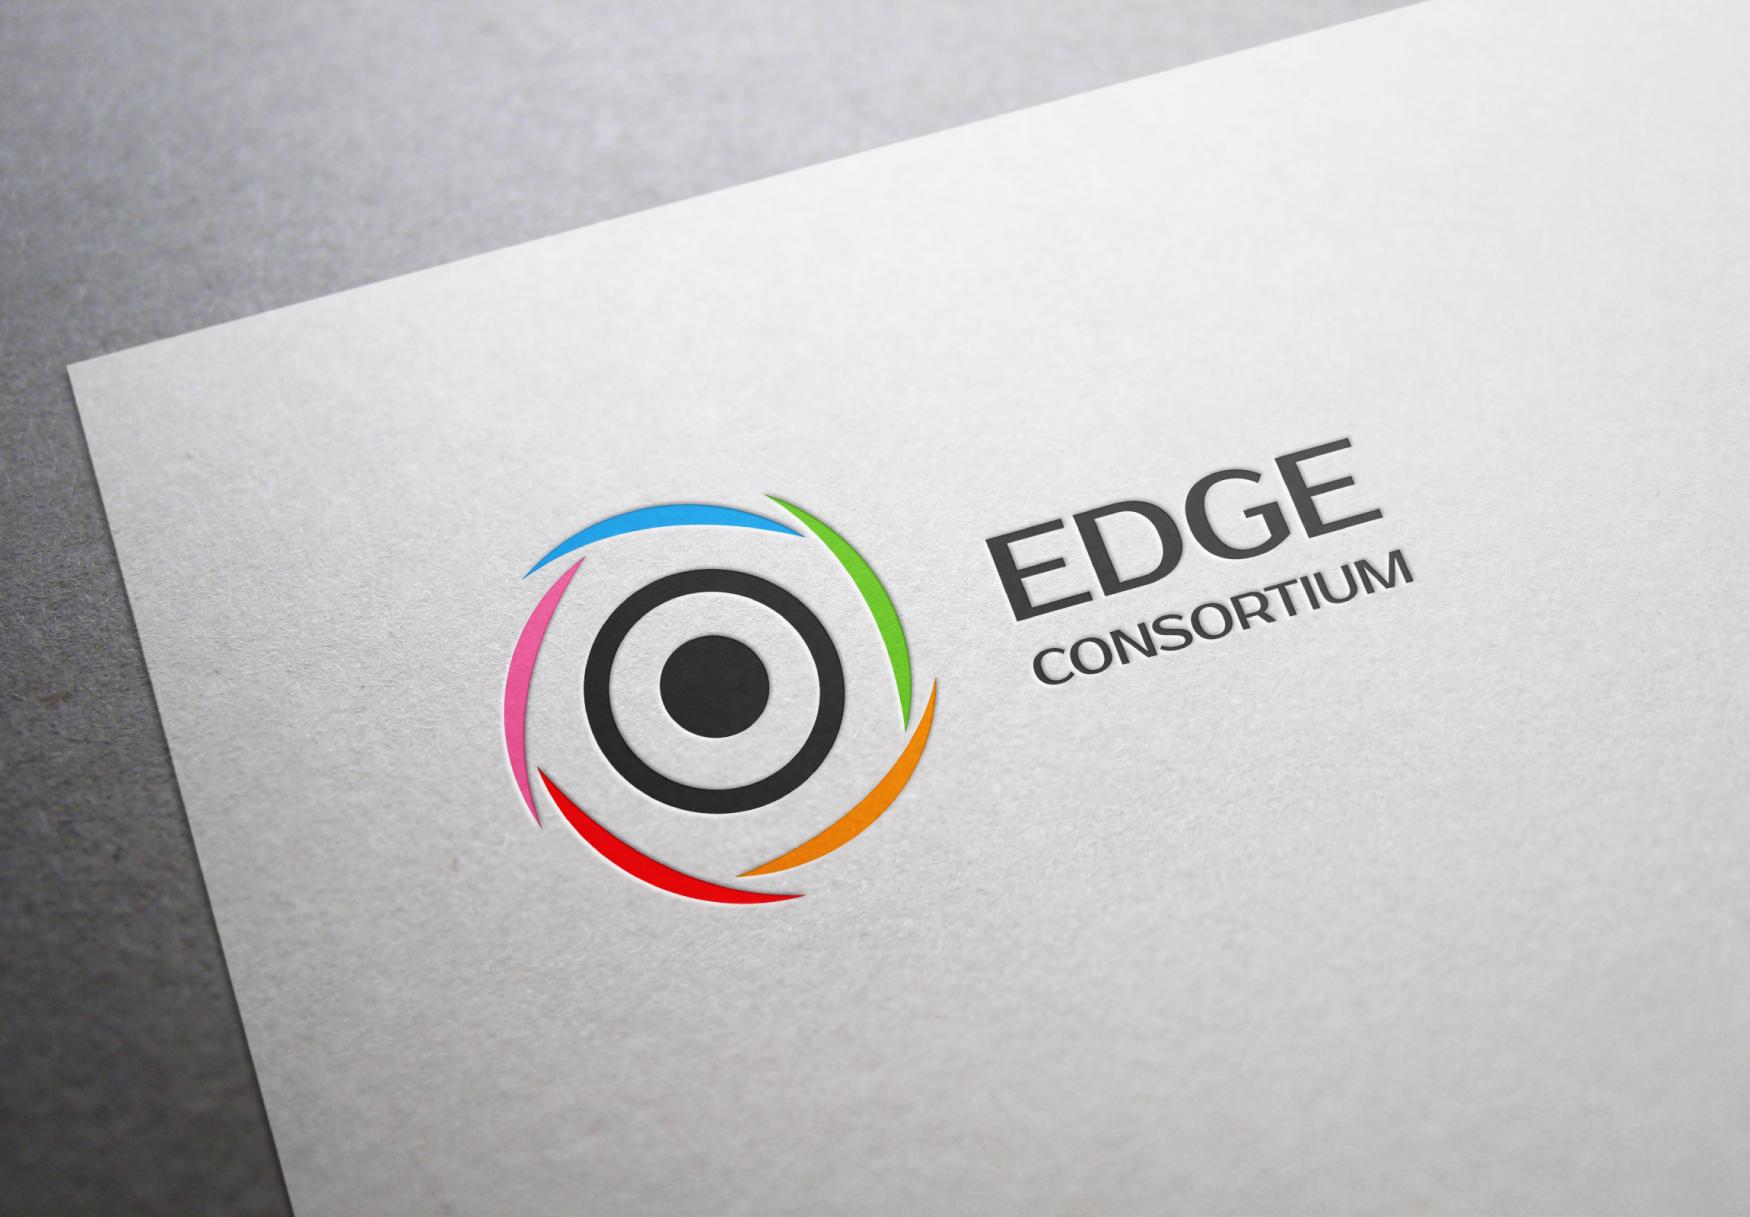 Edge Consortium needs a new logo